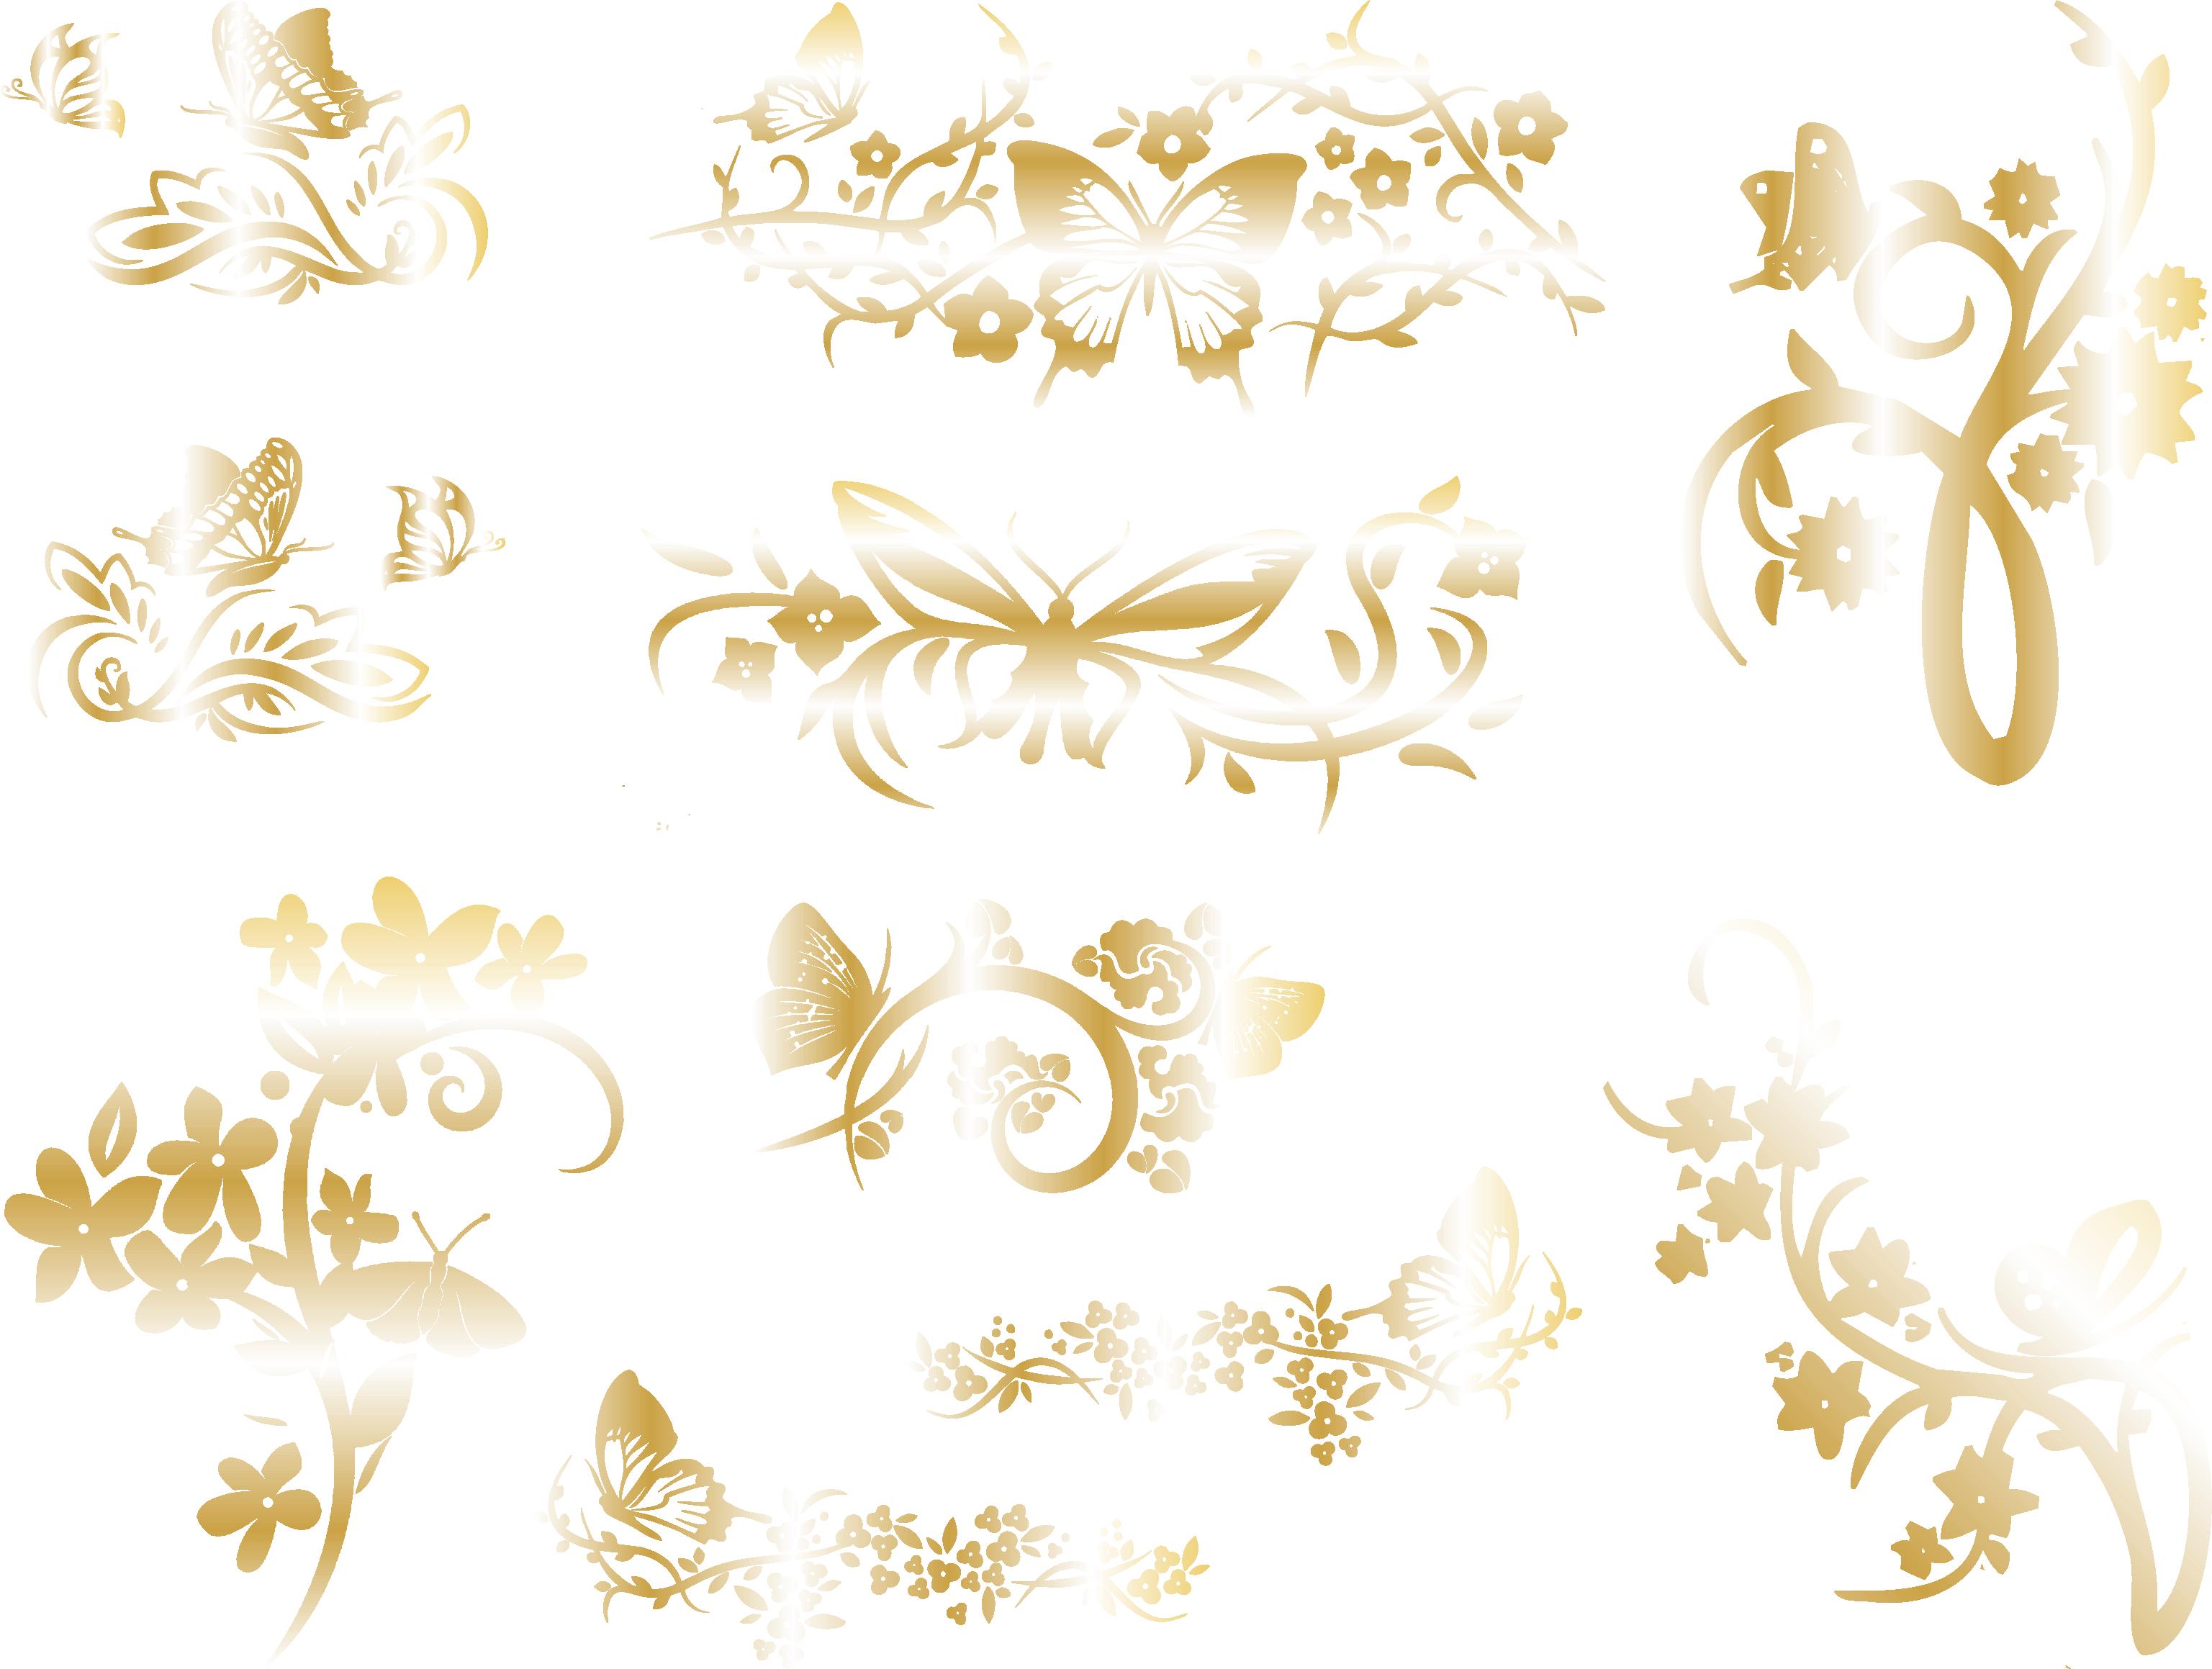 Бабочки силуэты золотые